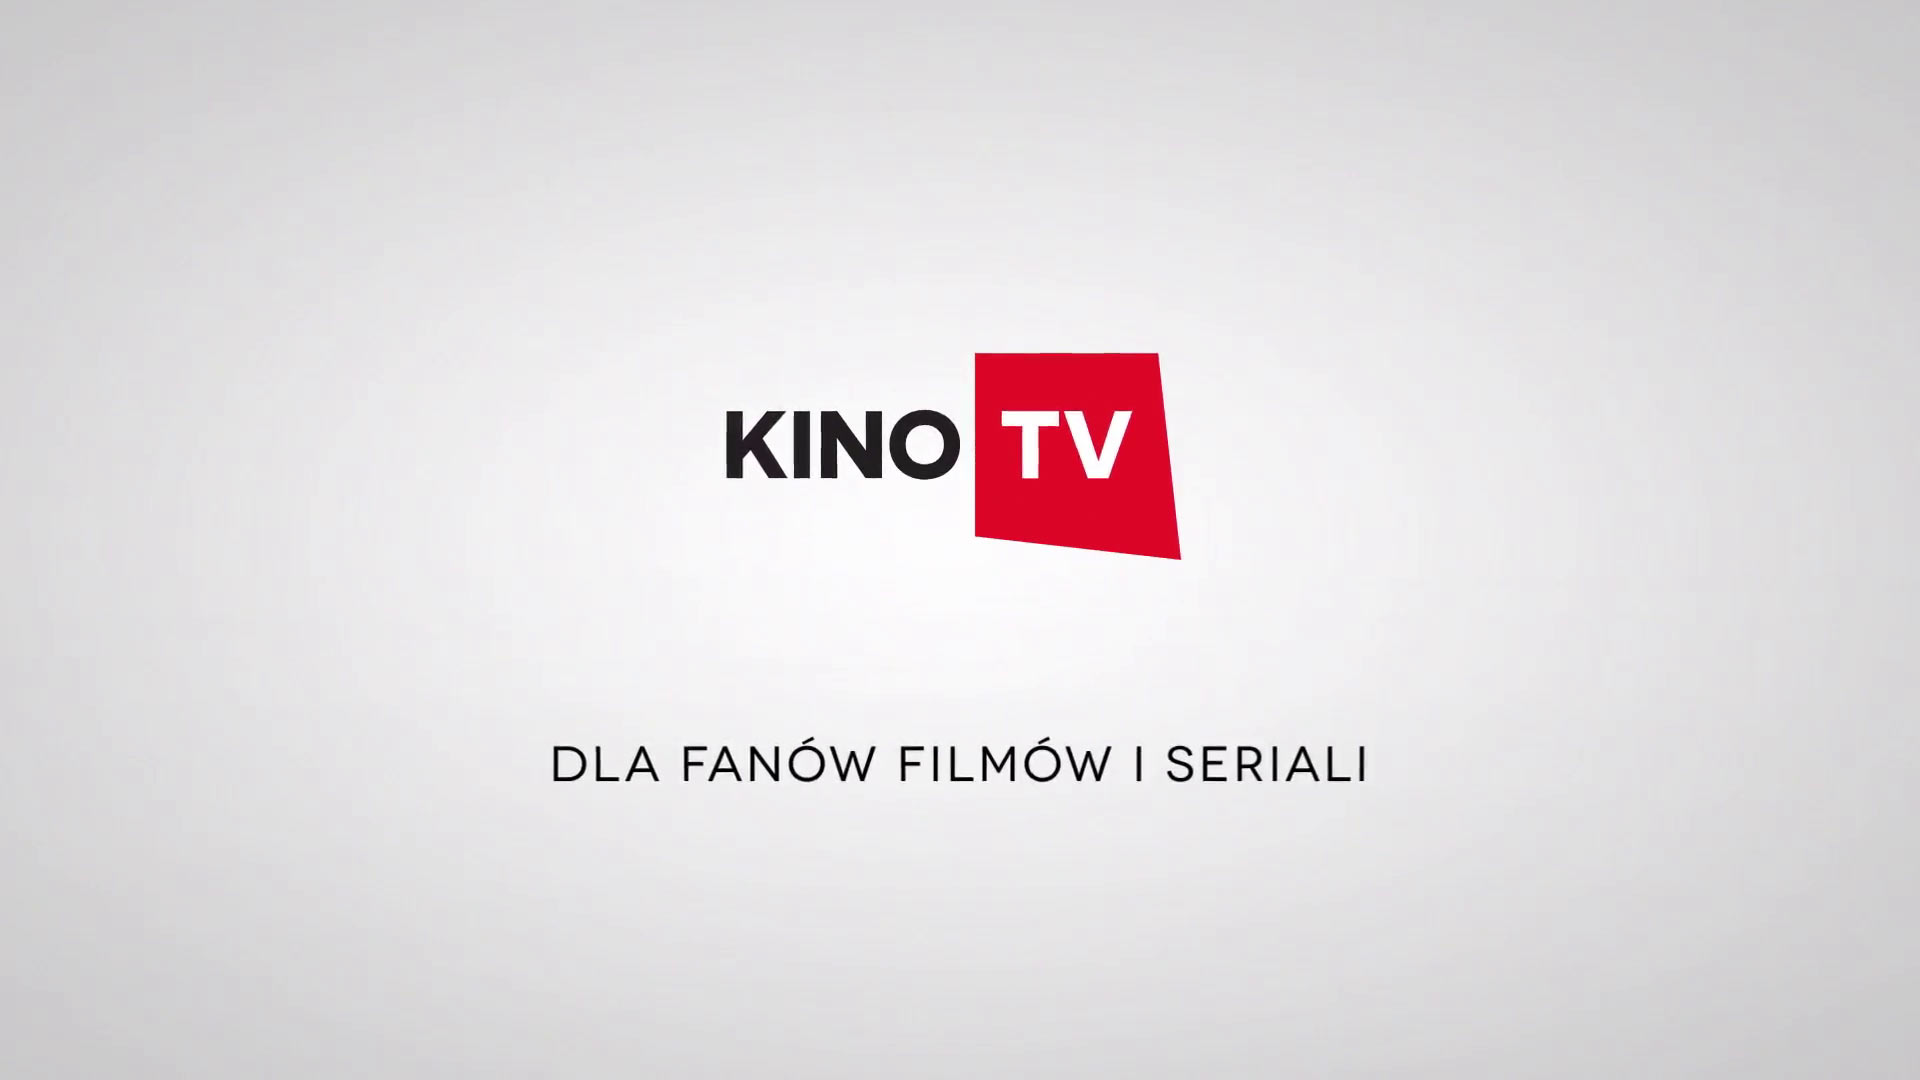 kino tv channel spi international